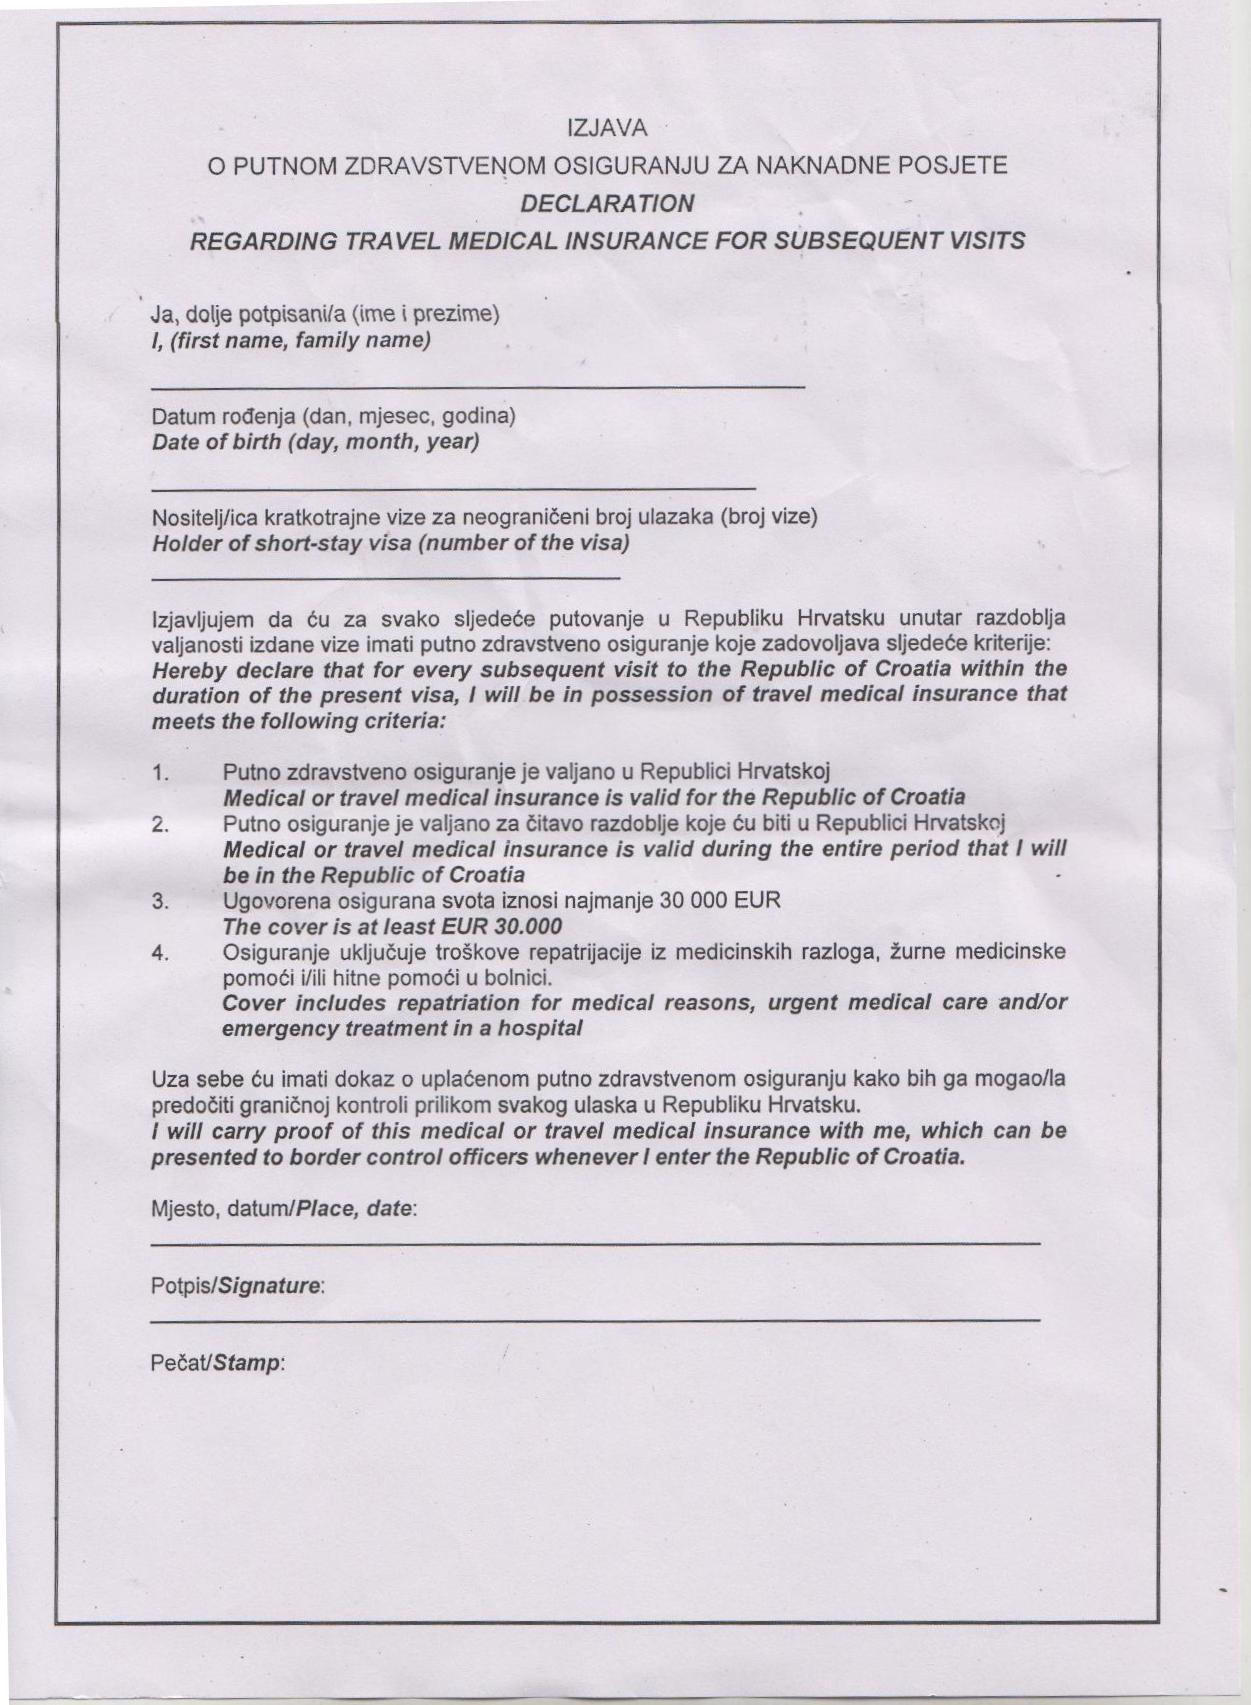 CROTIA-MEDICAL-DECLARATION Online Application Form For Canada Visa on